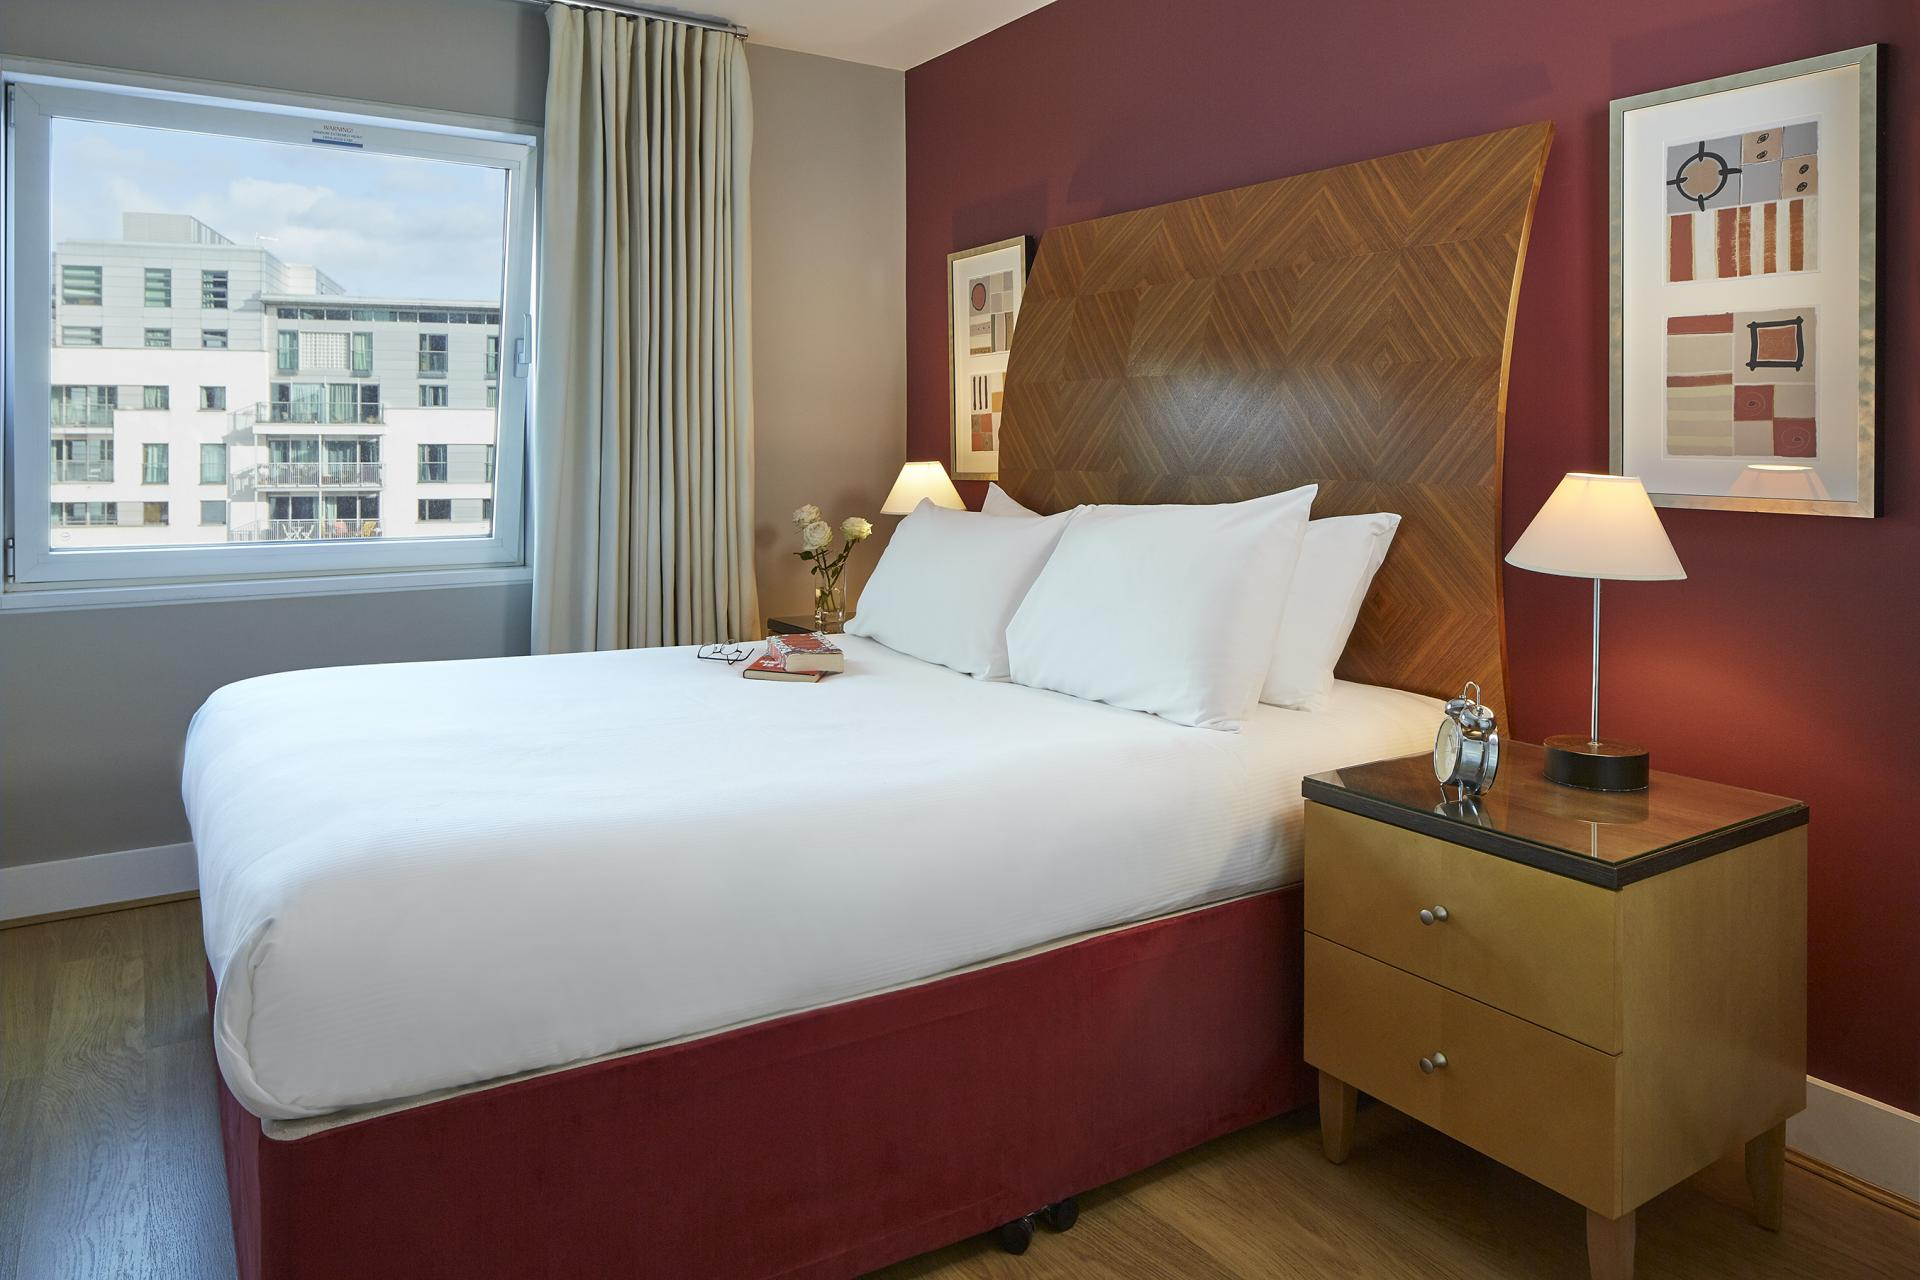 Bedroom at Empire Square Apartments, London Bridge, London